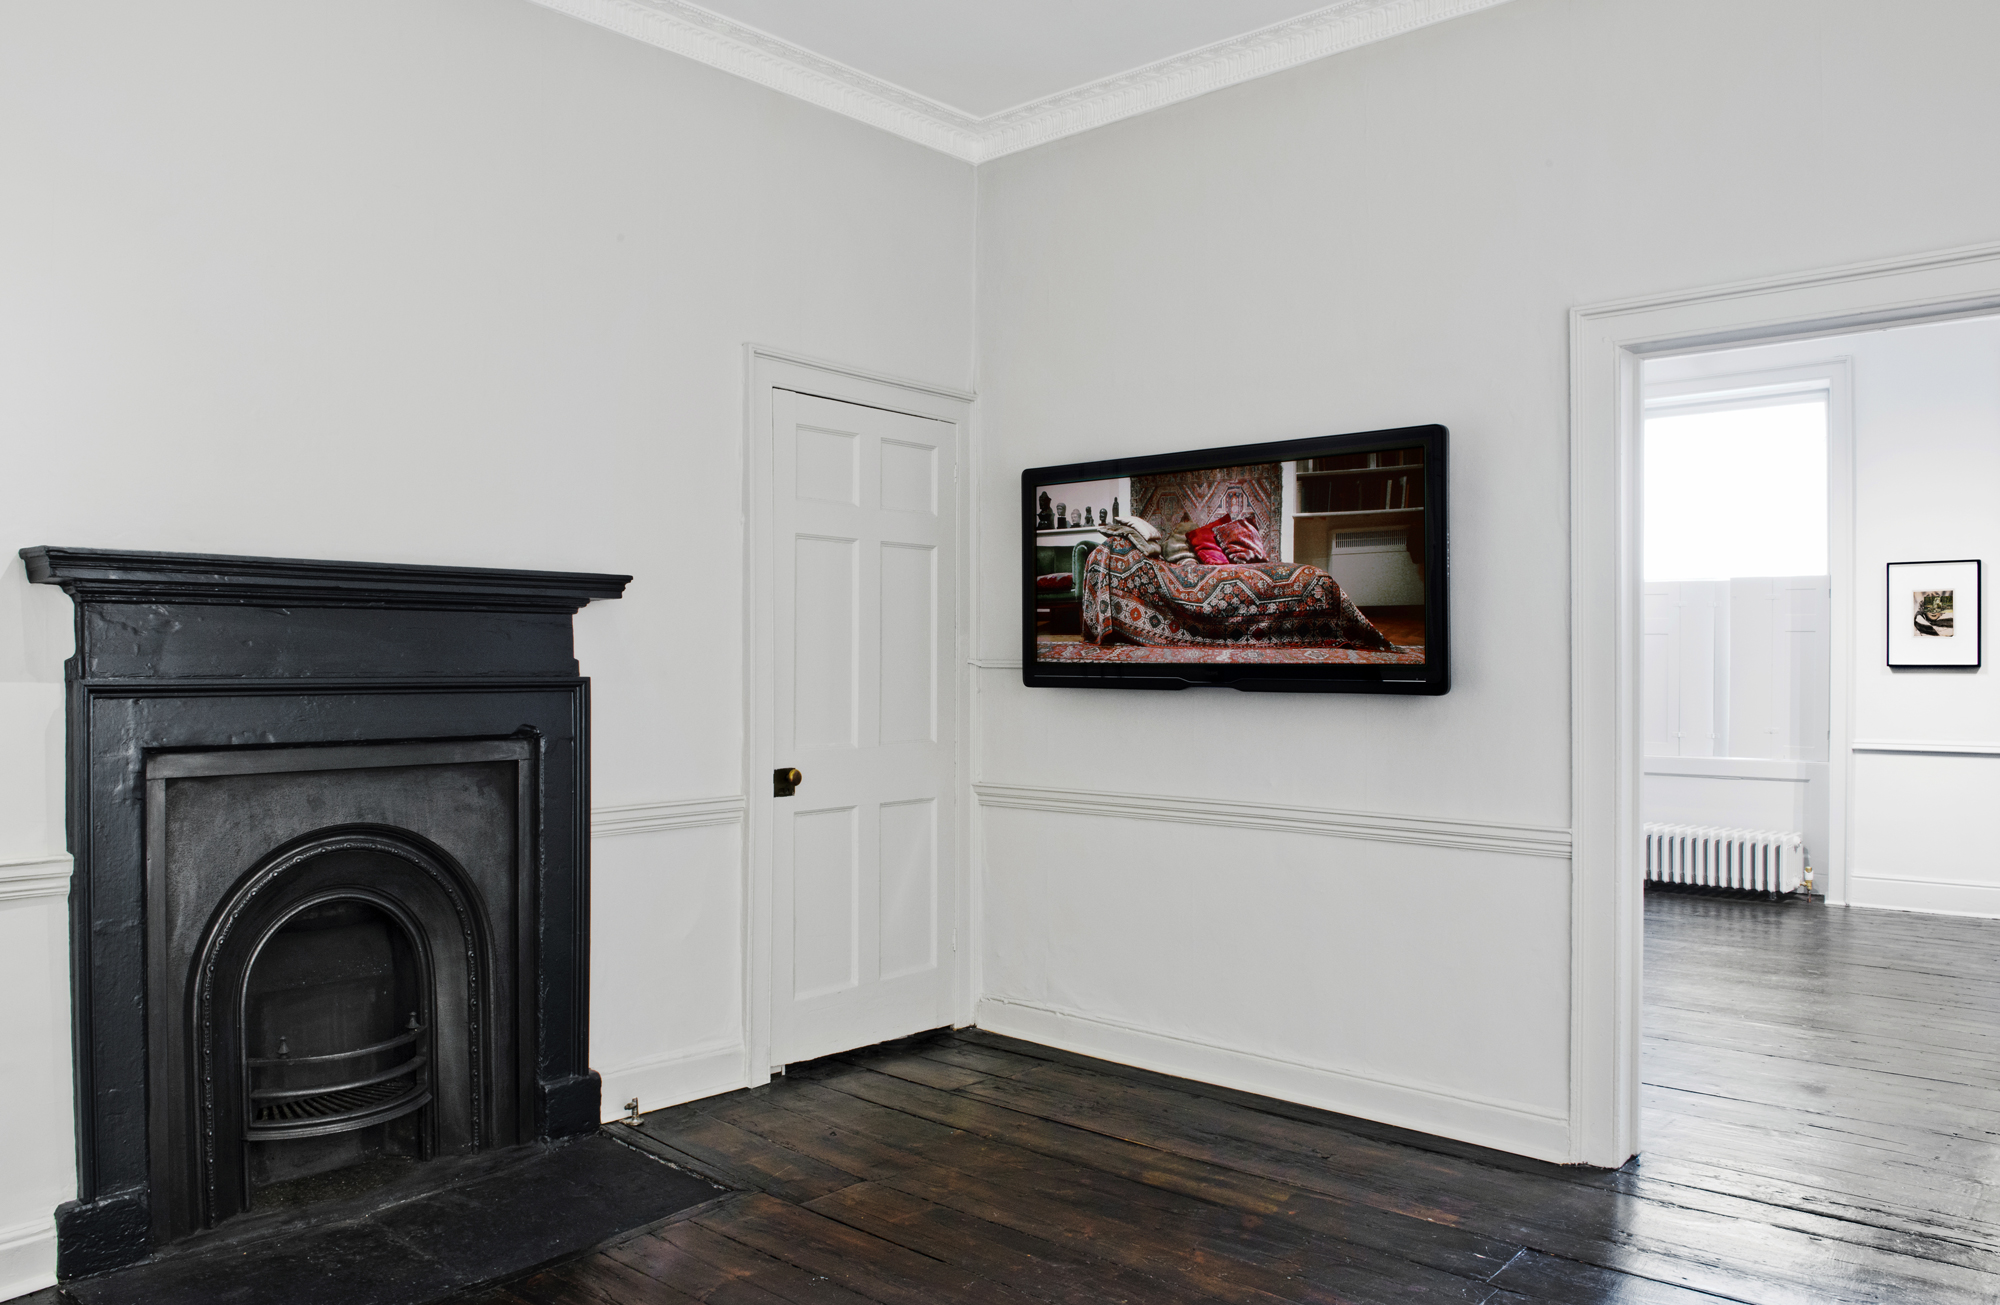 Installation view -Amie Siegel in foreground, John Stezaker in far room